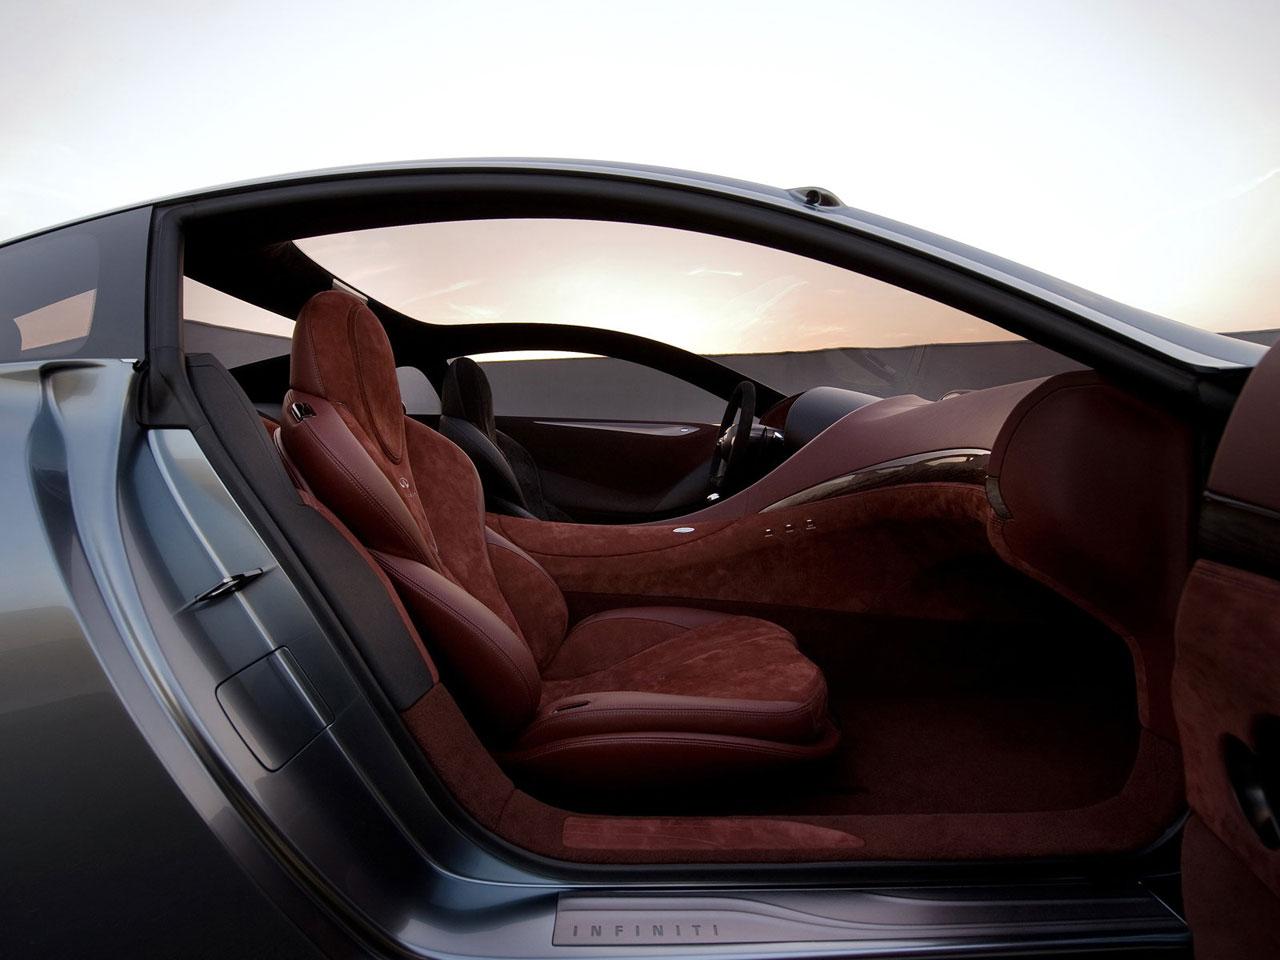 infiniti essence concept interior car body design. Black Bedroom Furniture Sets. Home Design Ideas